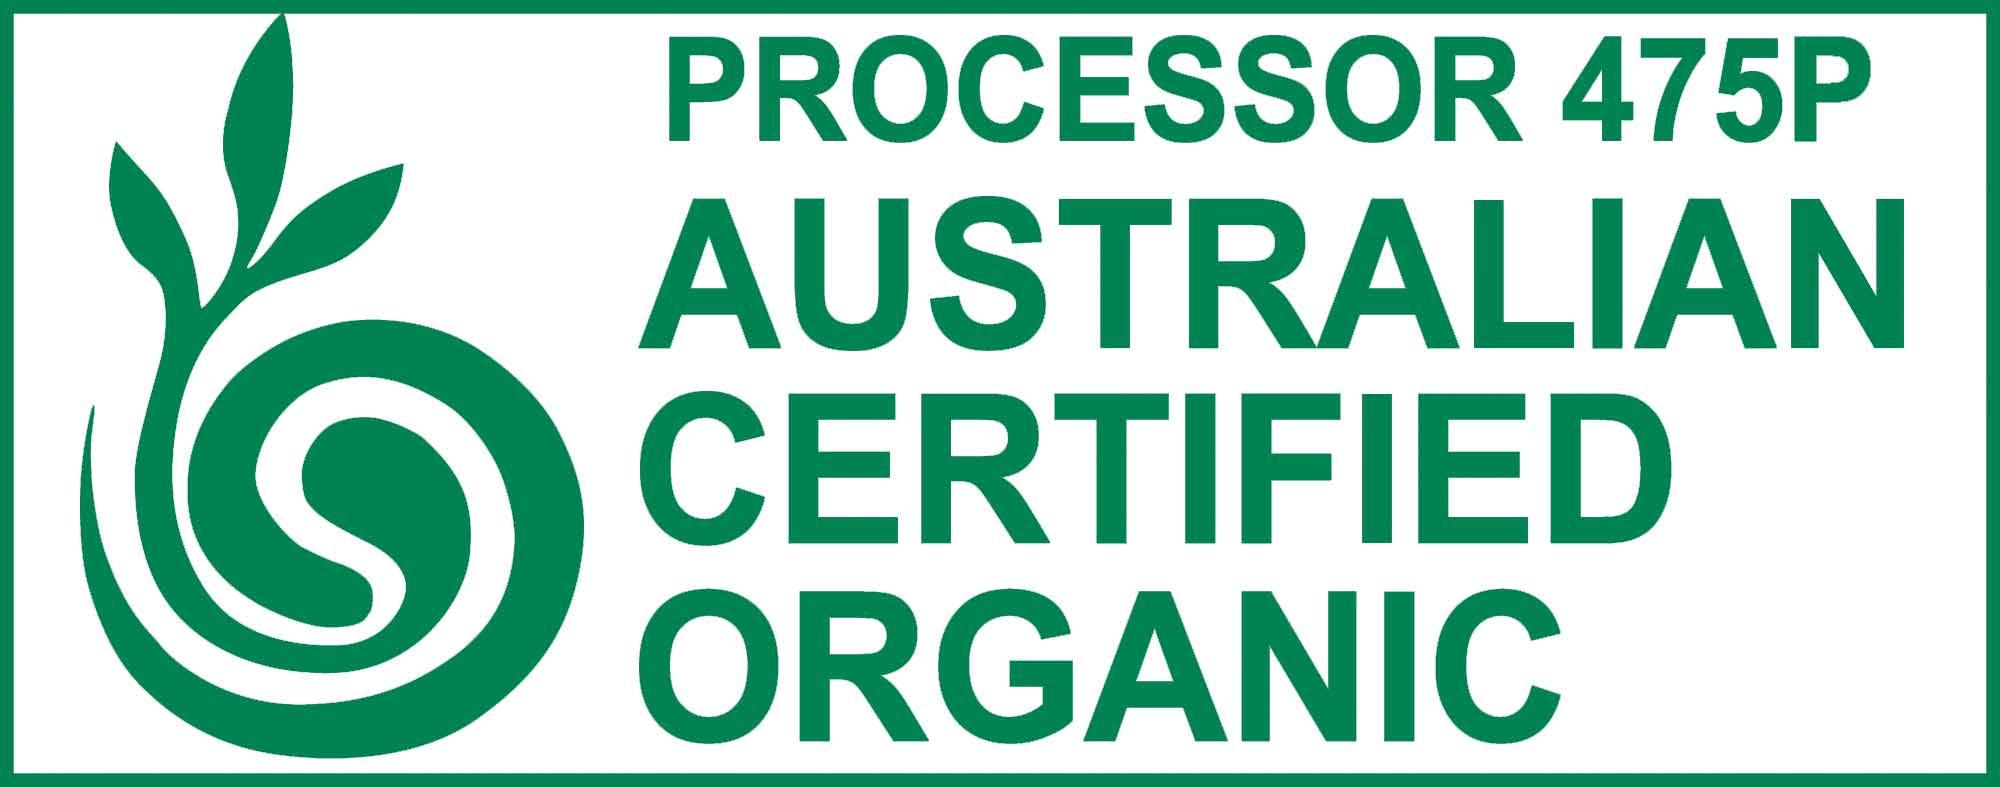 What do 'Australian Certified Organic' mean?